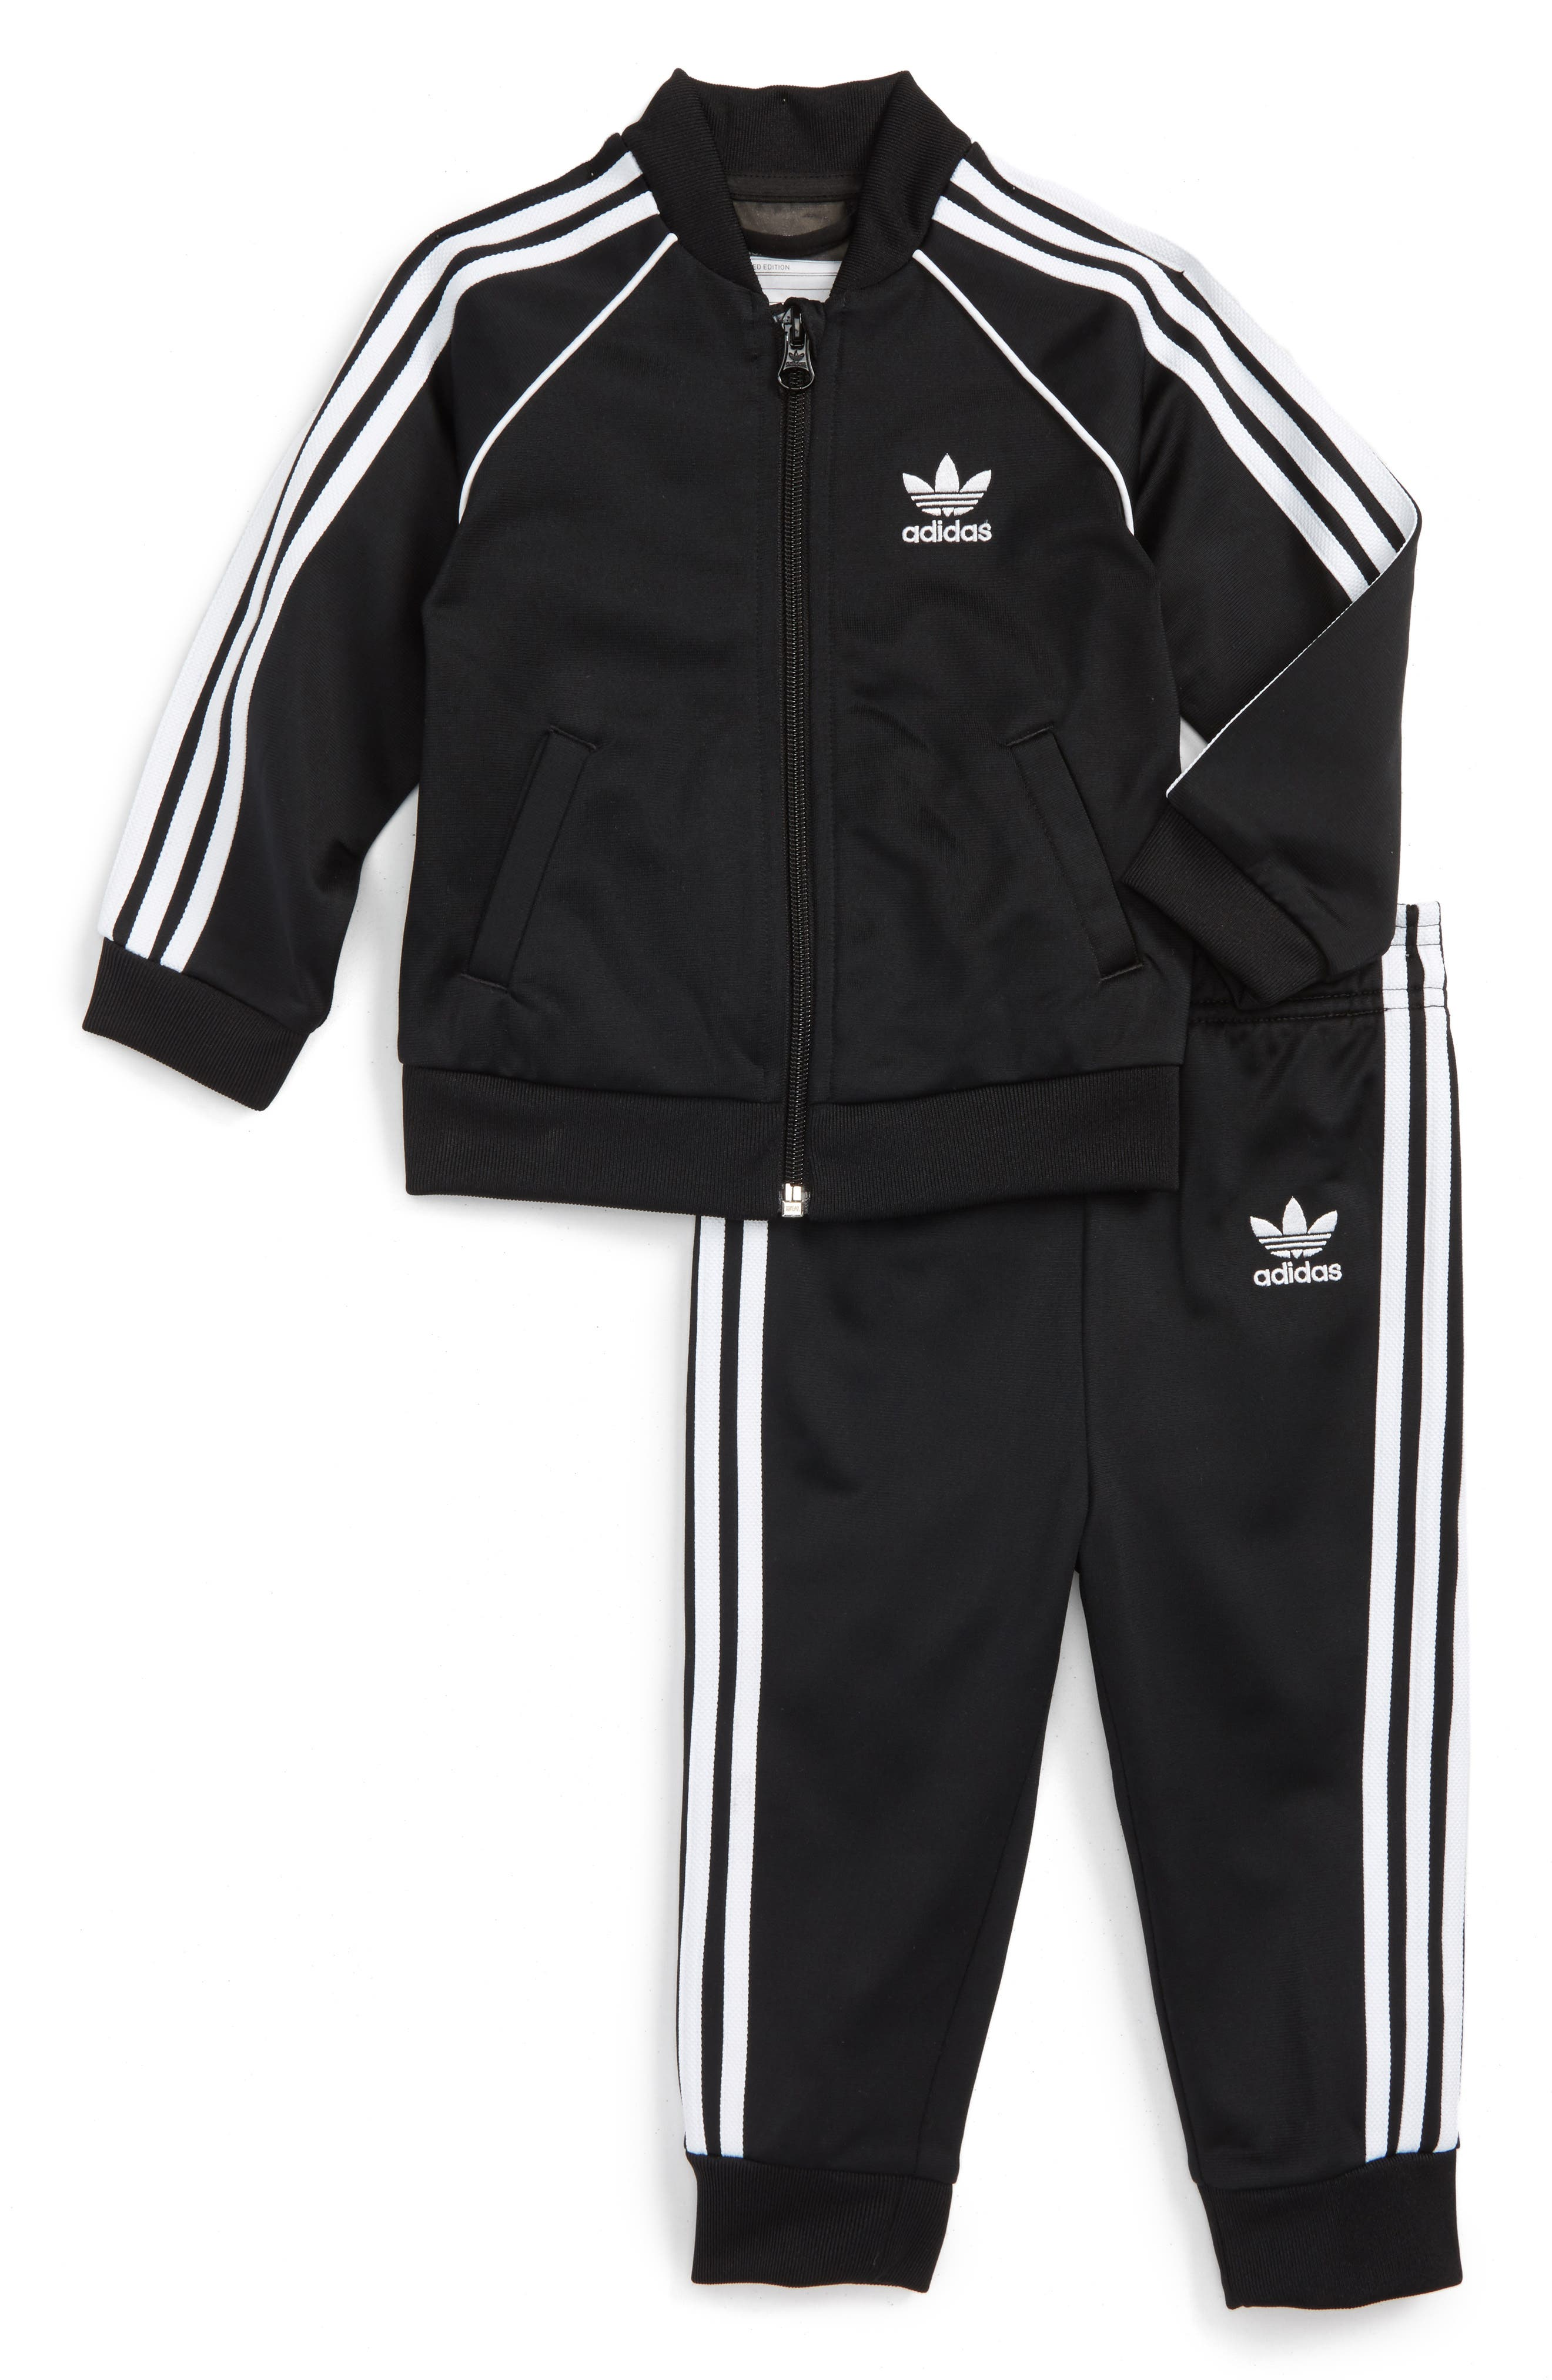 Main Image - adidas Originals Track Jacket & Athletic Pants Set (Baby)